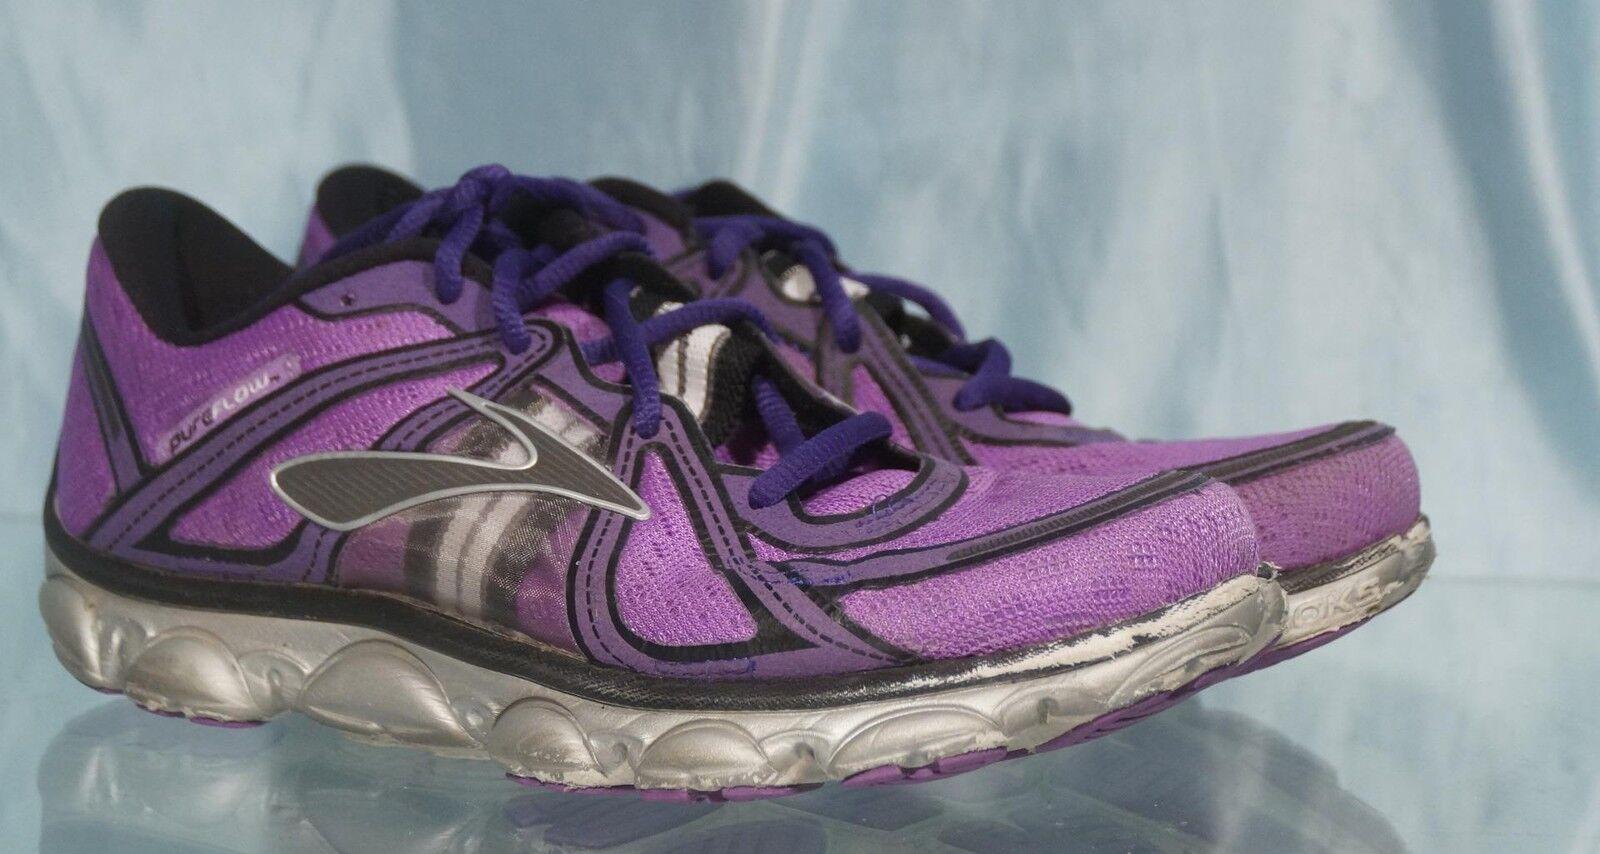 Nice Purple Grey Black BROOKS PURE FLOW Running shoes US Sz 7.5 UK 5.5 EUR 38.5